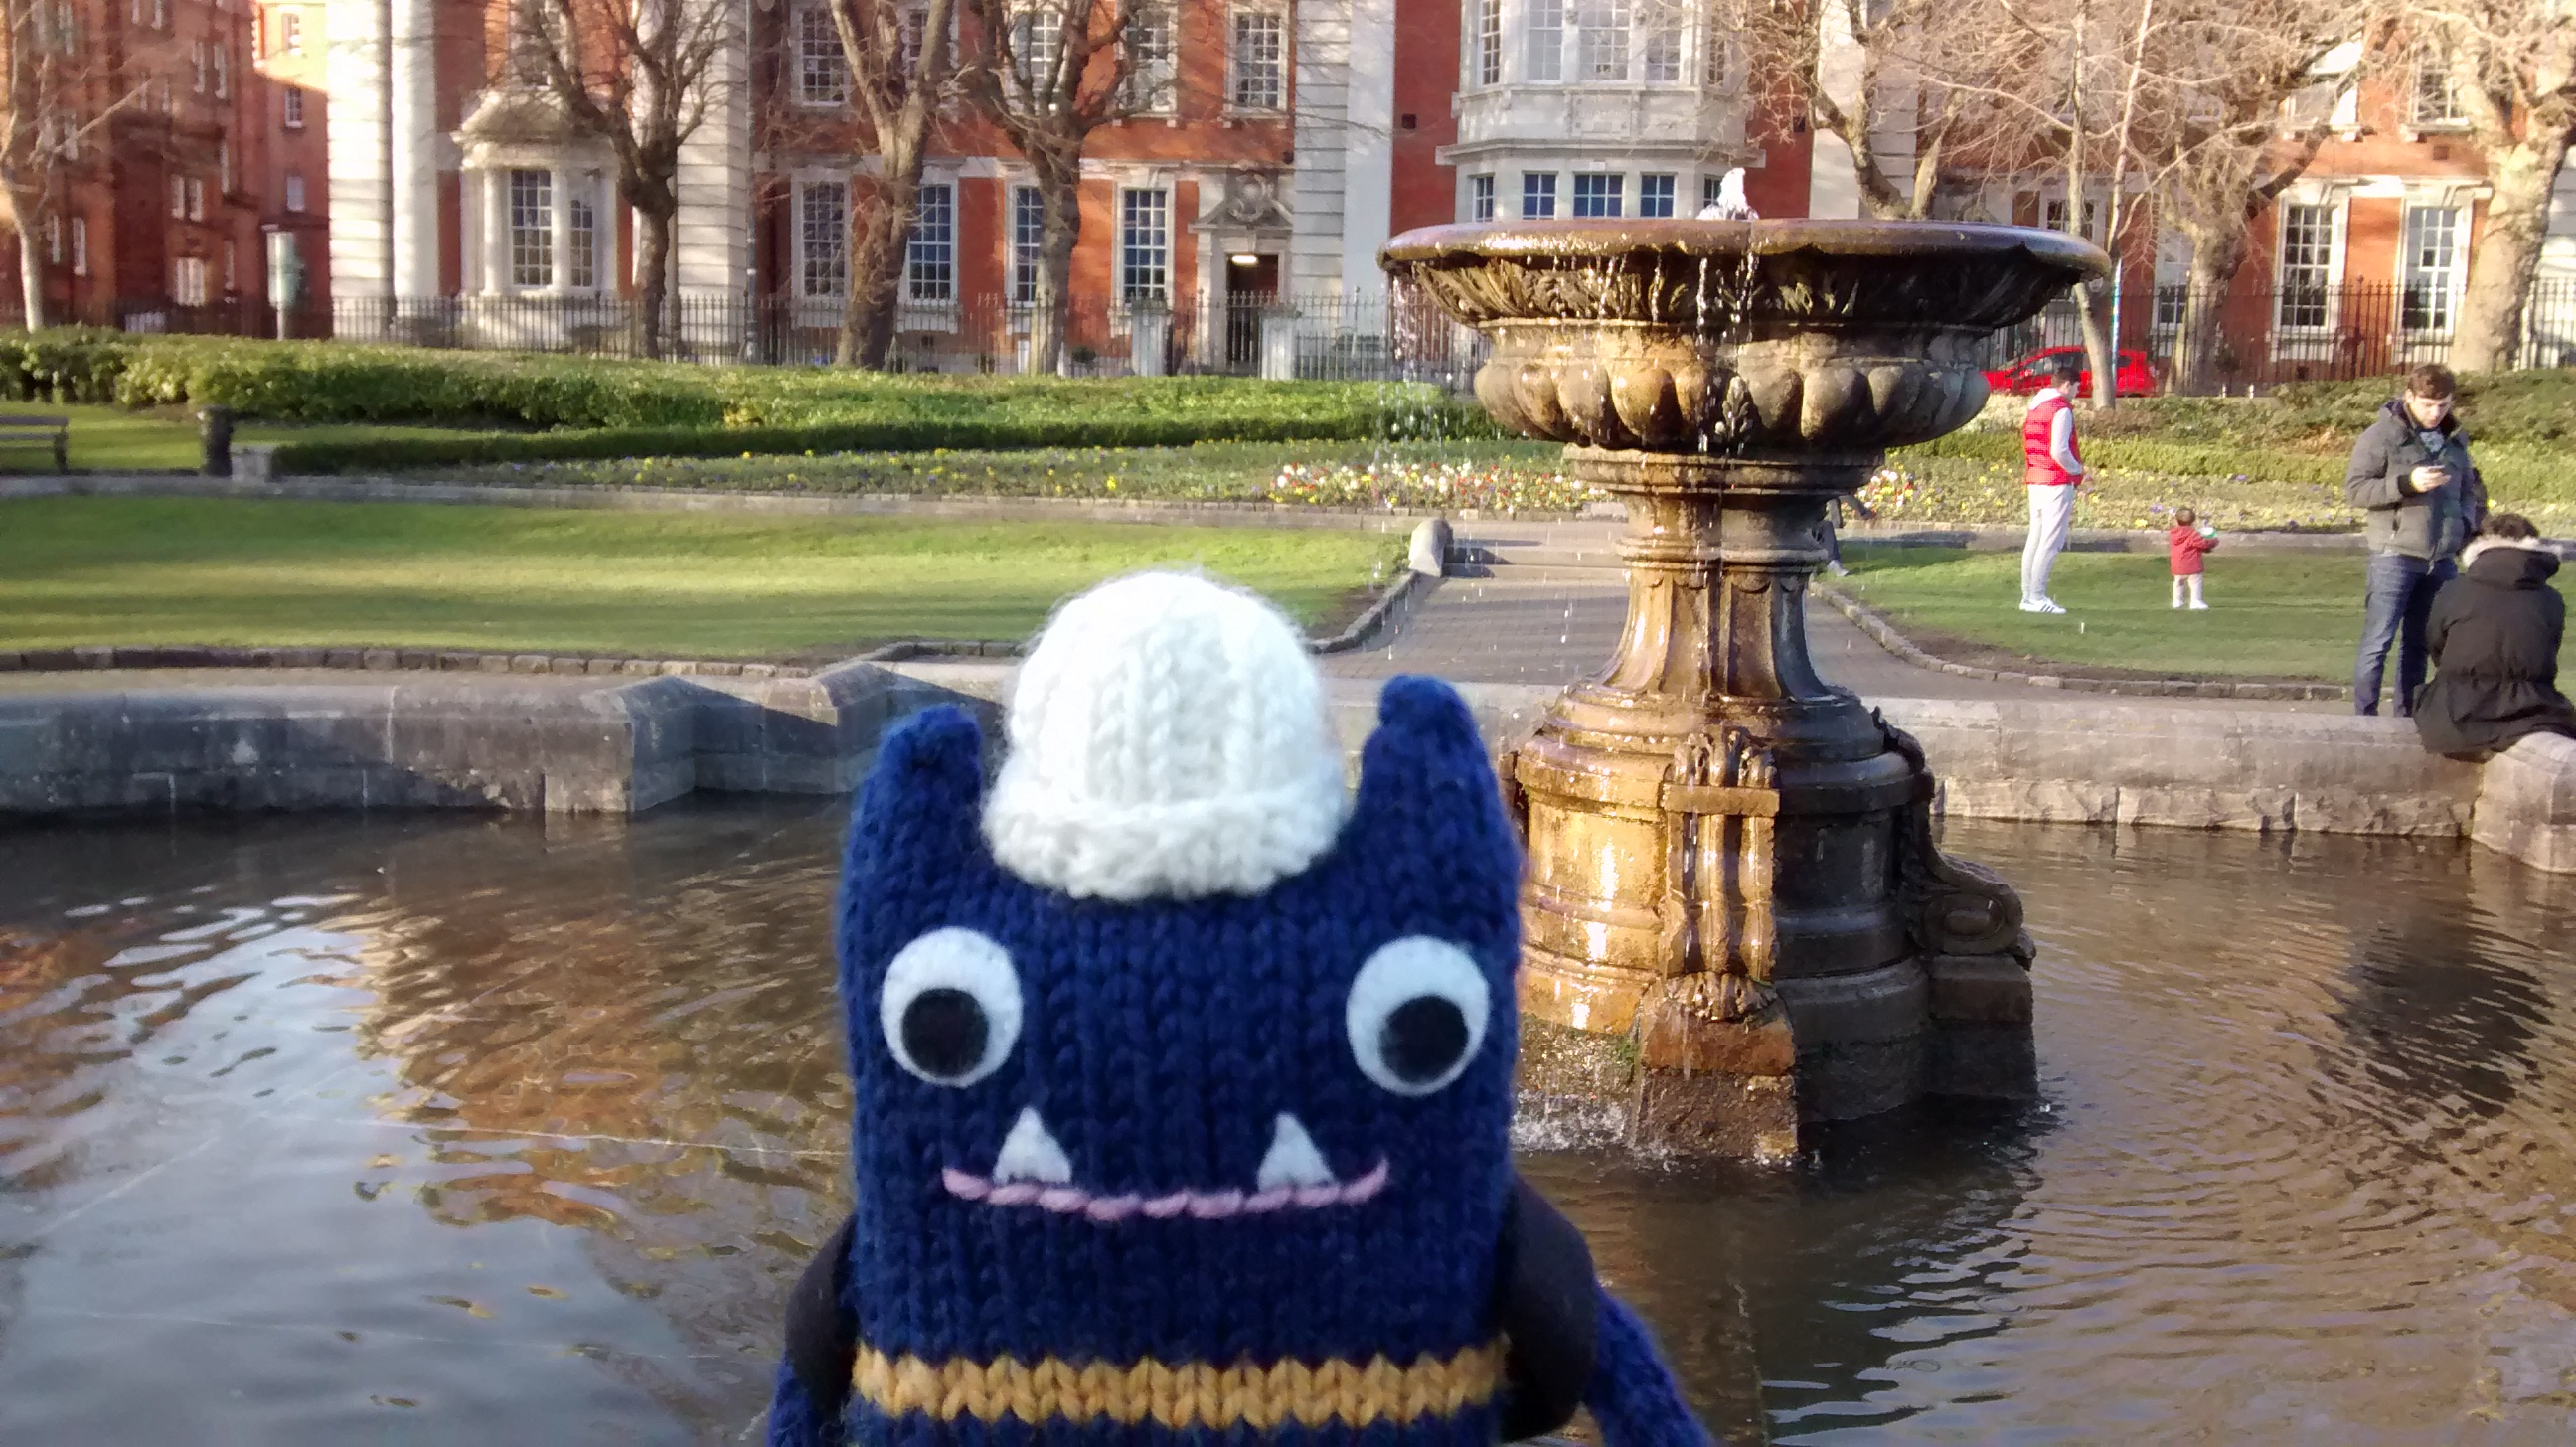 Explorer Beastie at the Fountain - CrawCrafts Beasties